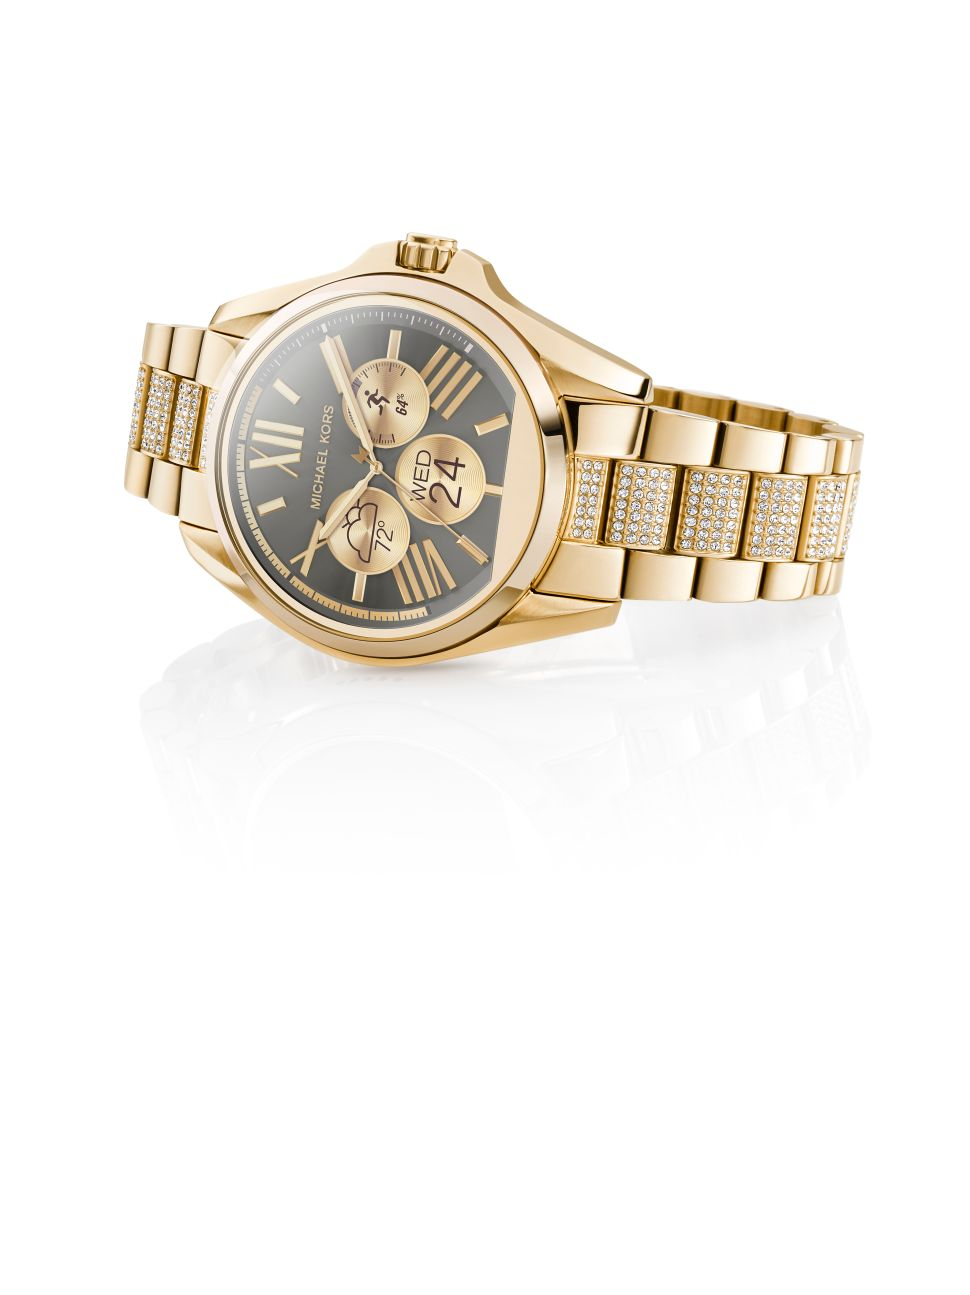 The Classic Michael Kors Watch Receives a Digital Update